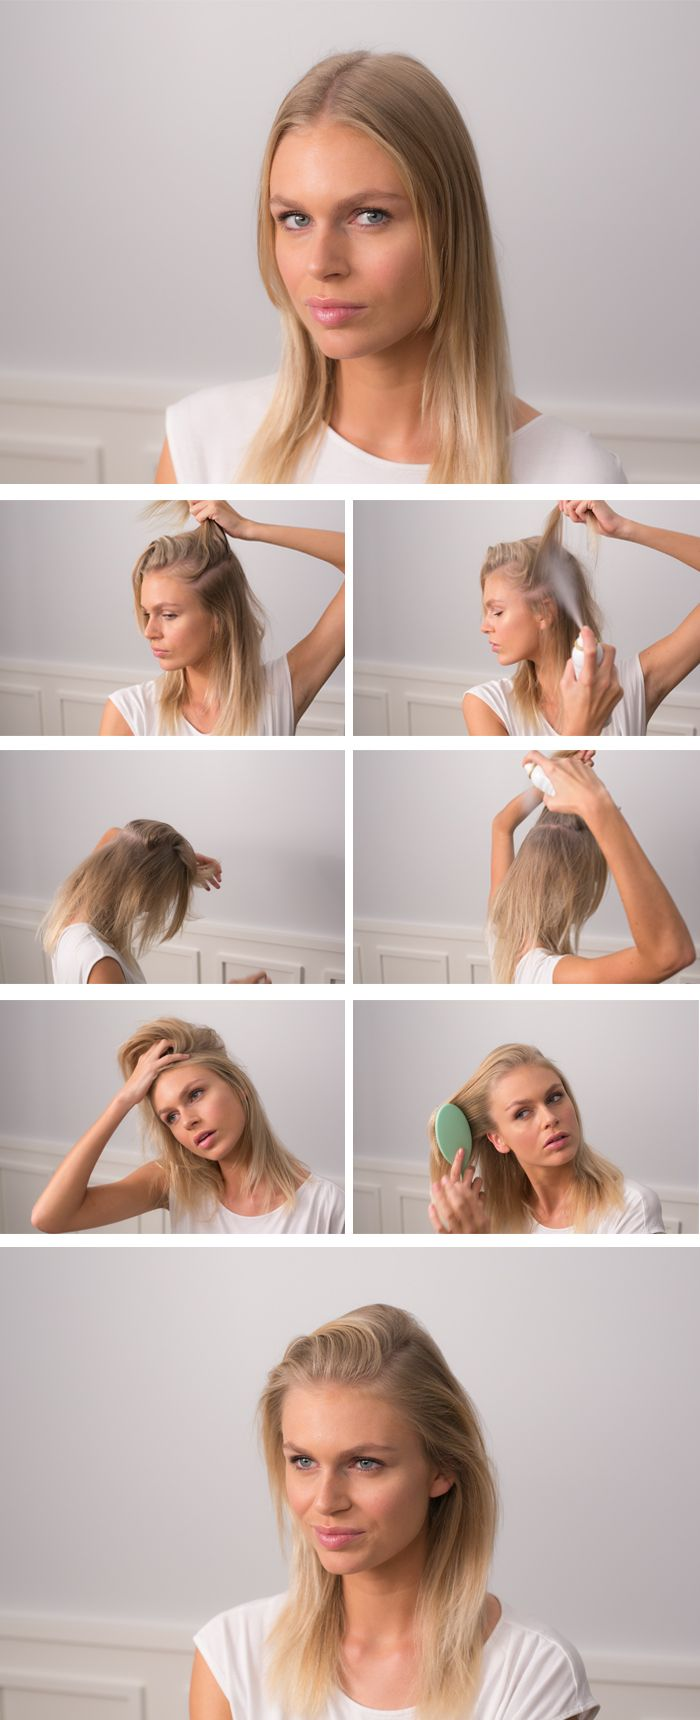 Hair Tutorial How To Apply Dry Shampoo Hairstyles For Thin Hair Dry Shampoo Hair Beauty